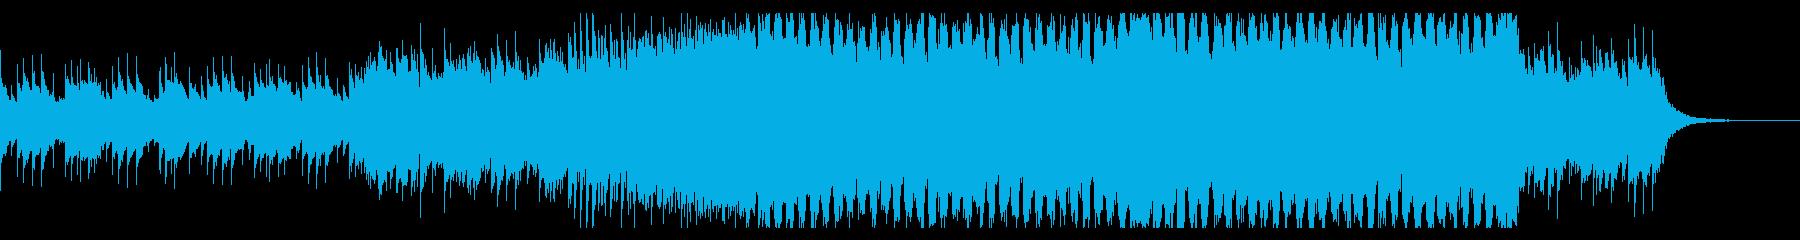 【CM・企業VP】EDMアンセム風の再生済みの波形